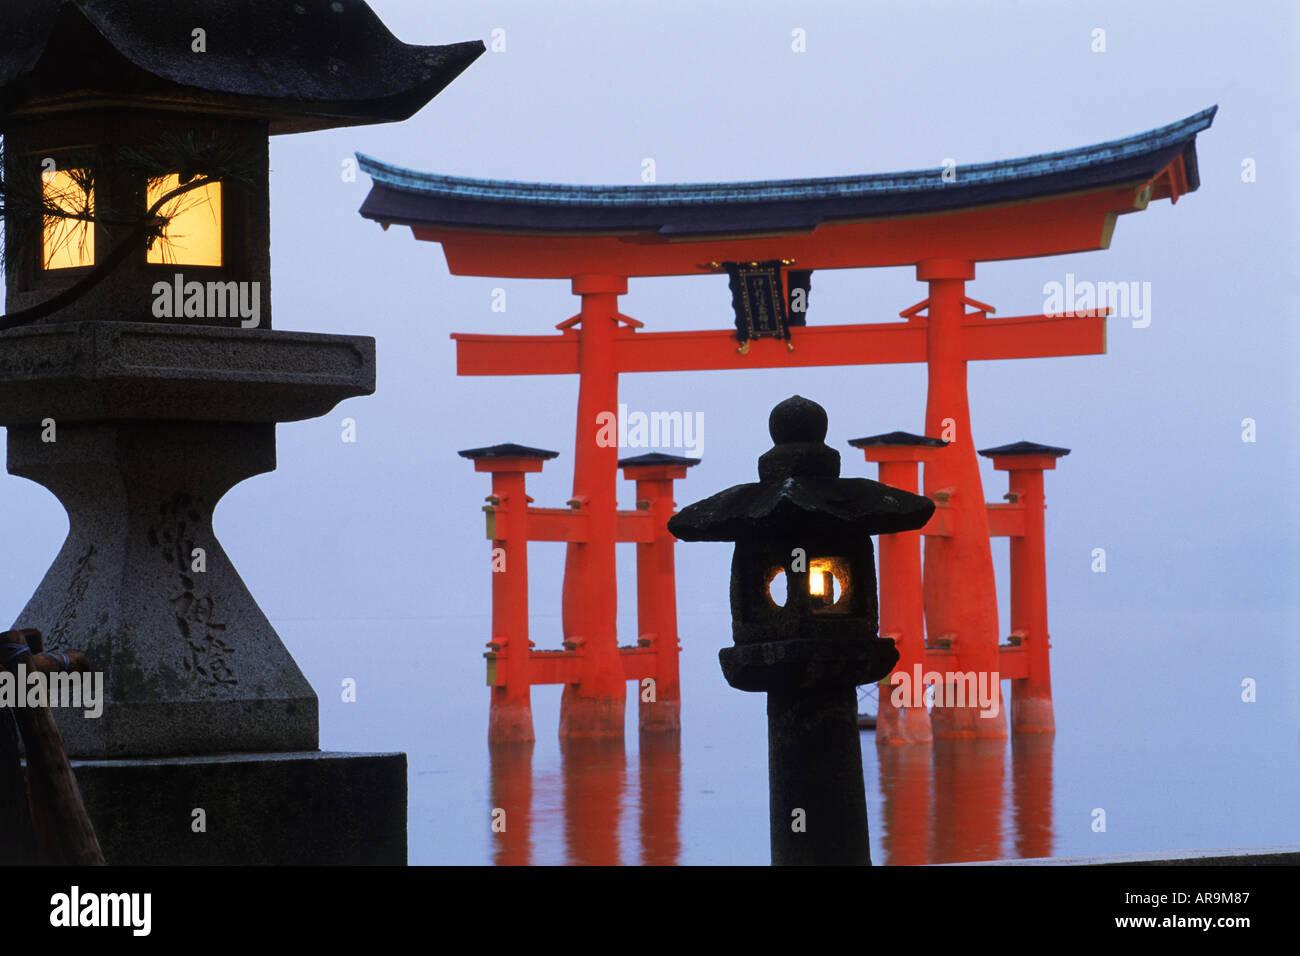 Itsukushima Torii (temple gate) in the sea in misty twilight on Miyajima Island. Japan - Stock Image